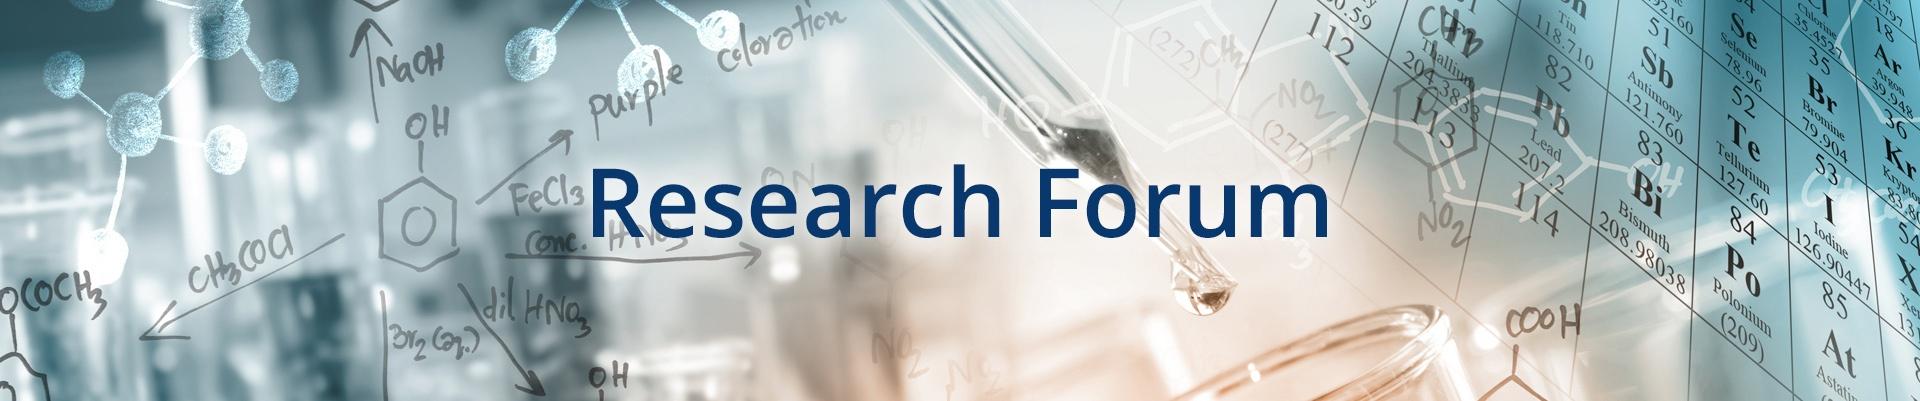 ResearchForumHeader1.jpg